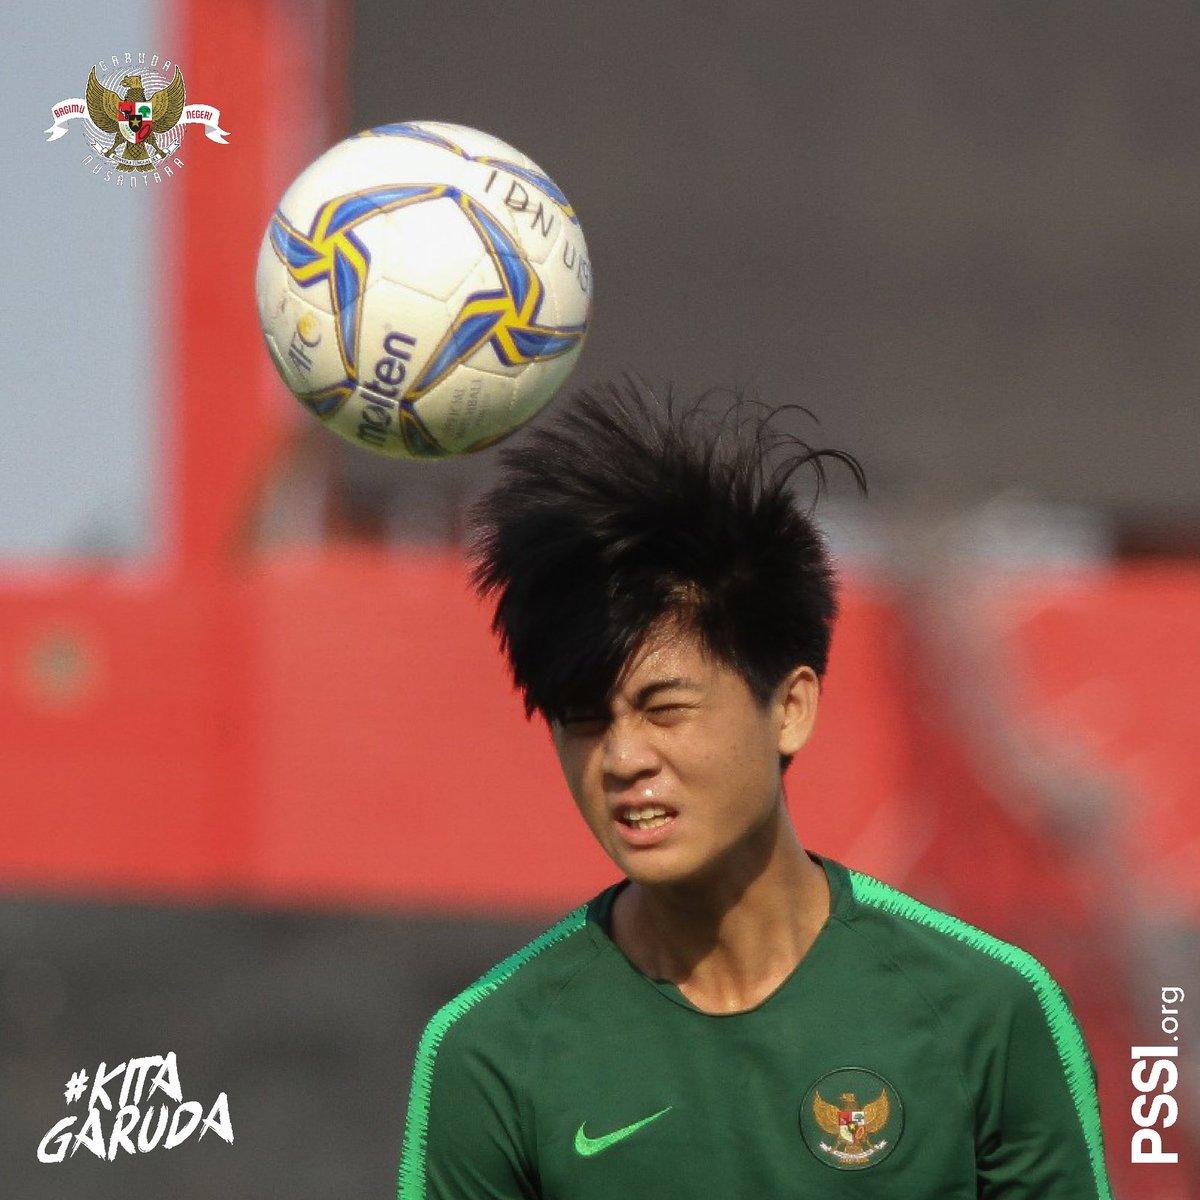 Menghitung mundur sepak mula laga Timnas Indonesia U-19 kontra China.  #PSSINow #KitaGaruda https://t.co/KdnJLoI24v